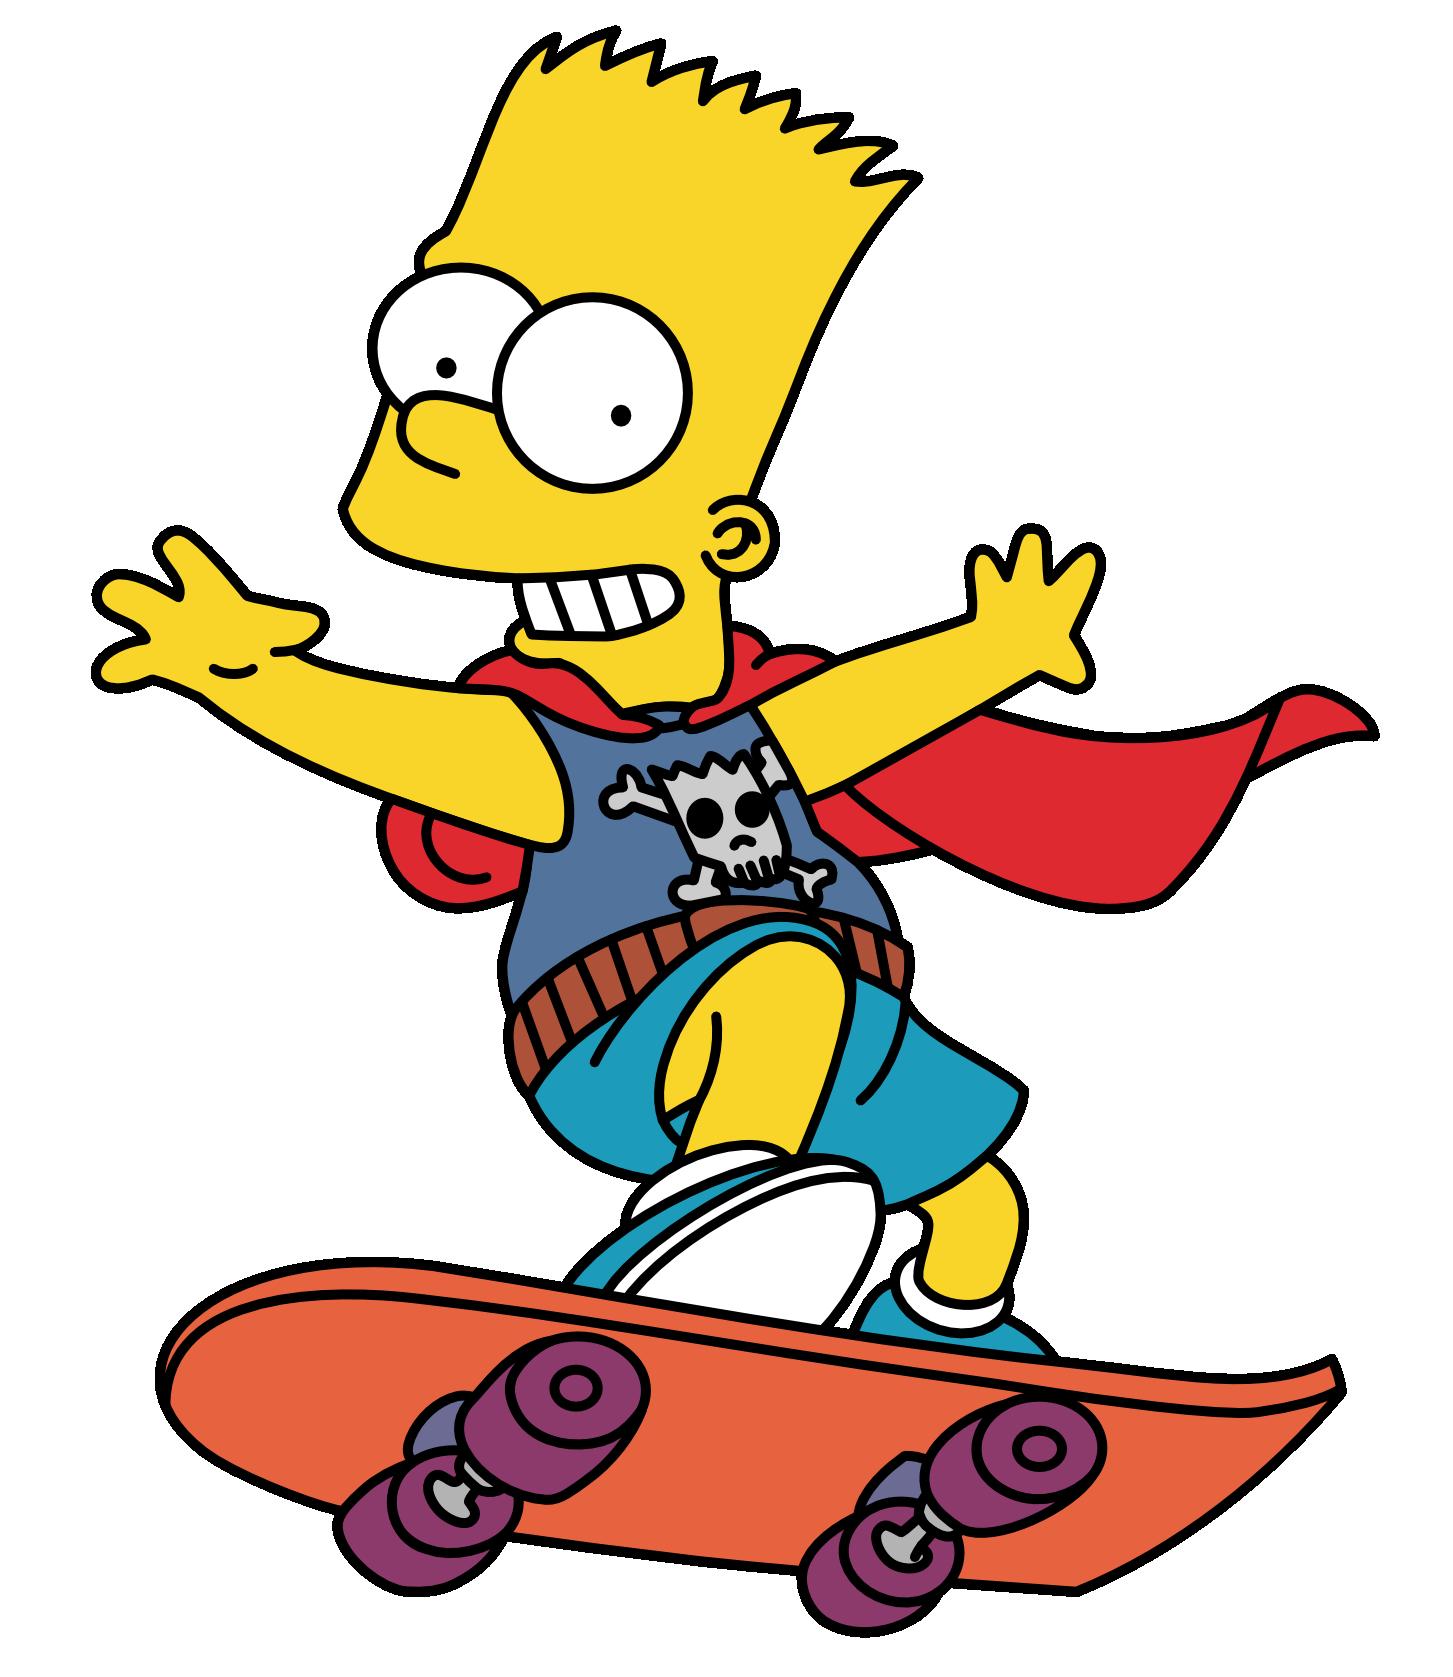 Bart Simpson Png Image PNG Image - Bart HD PNG